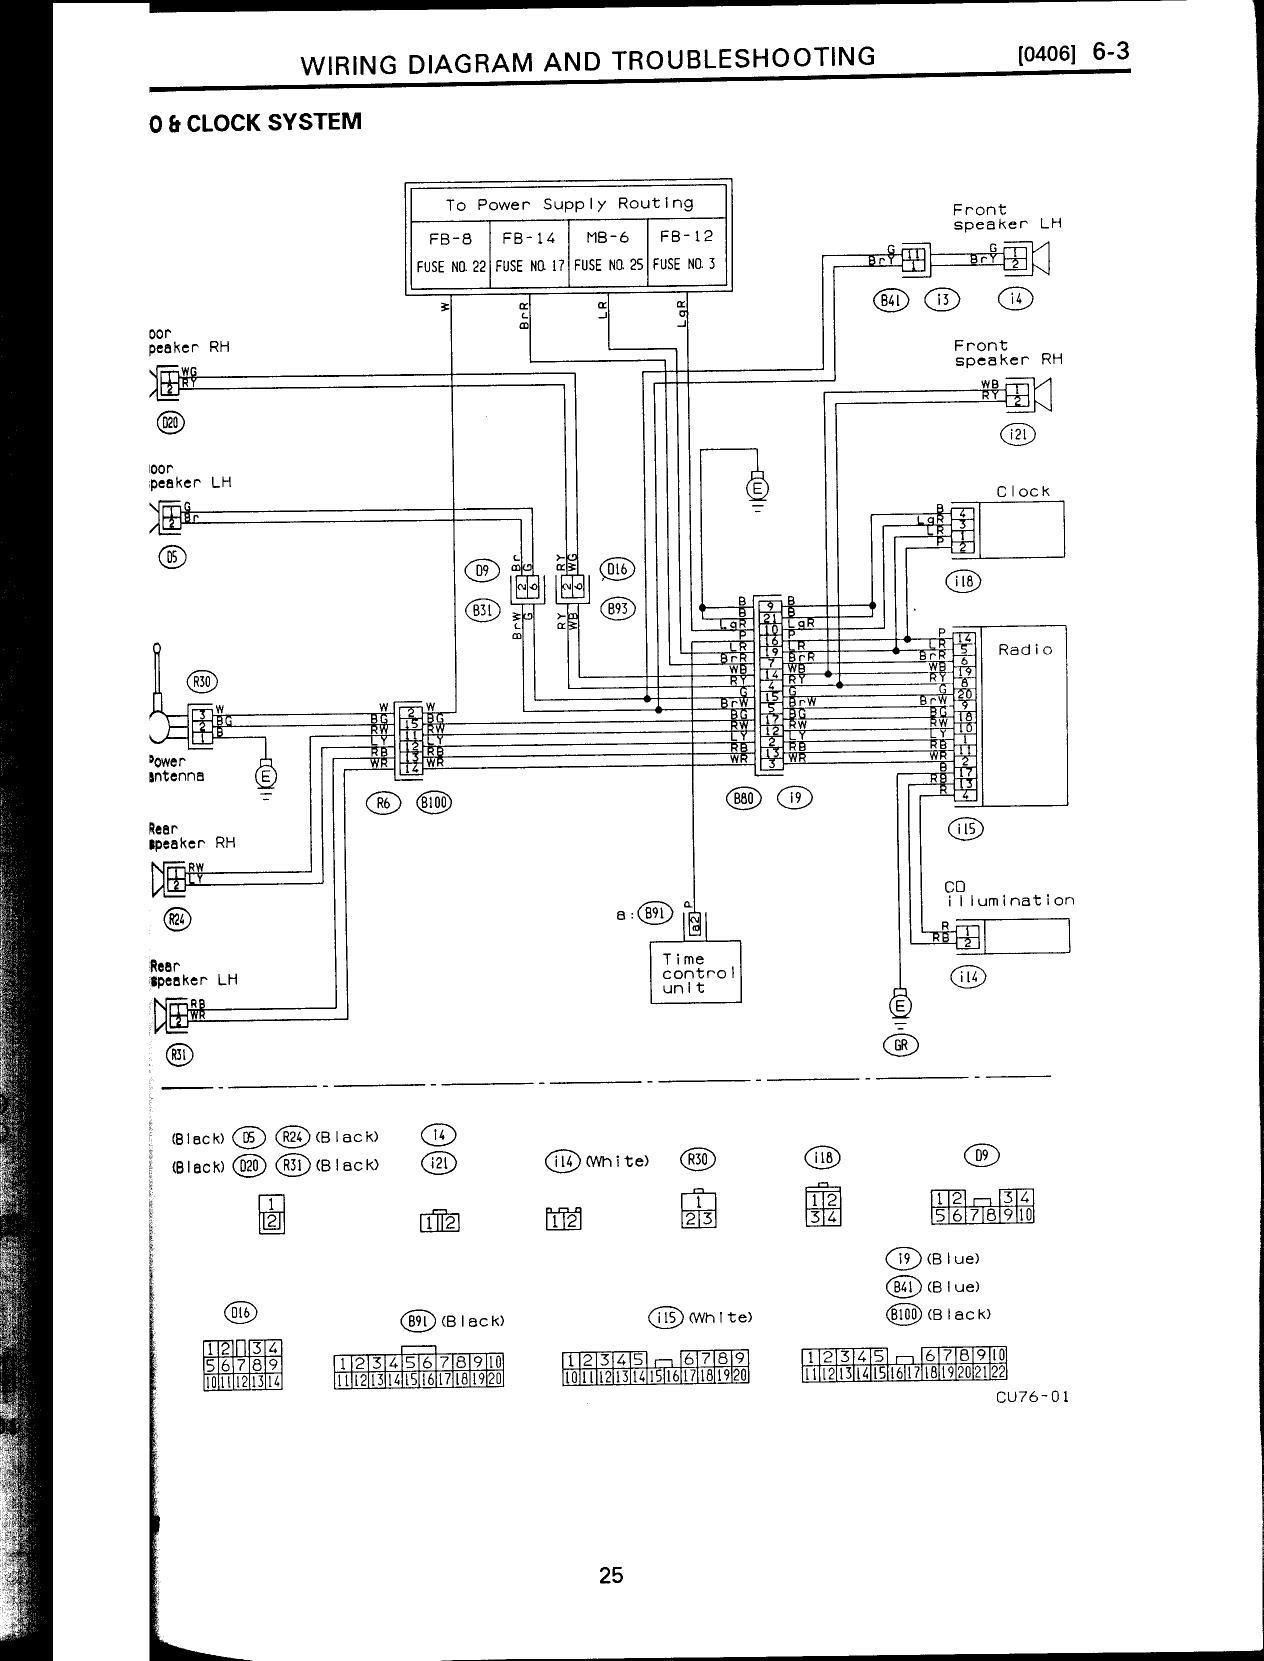 1993 Subaru Wiring Diagram